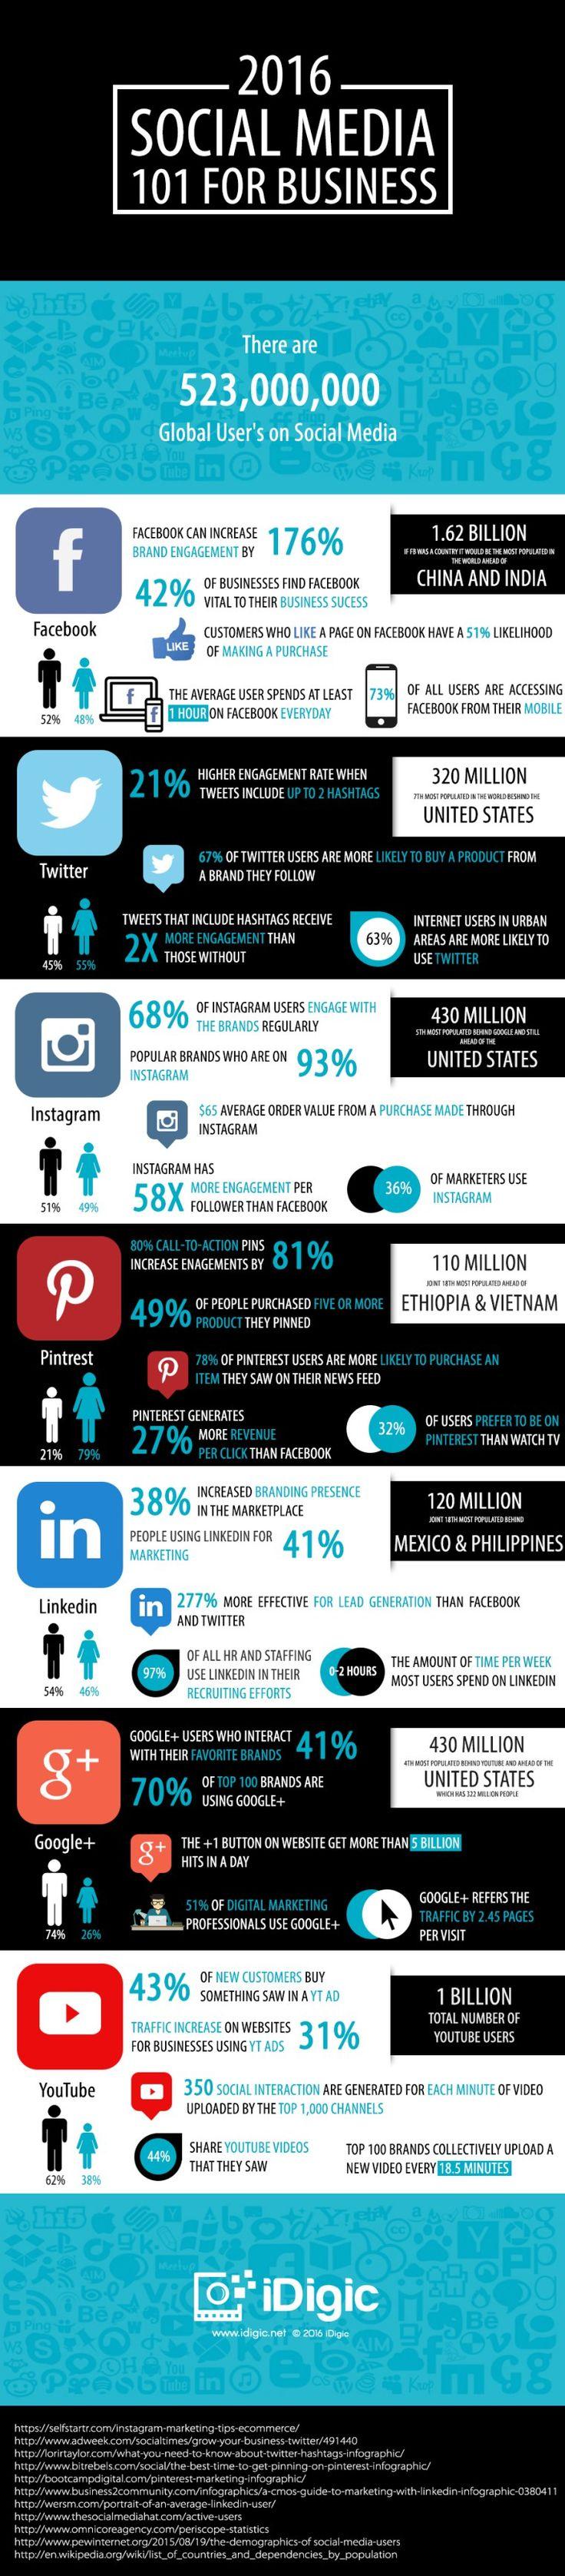 Social Media 101 For Business - Factosocial